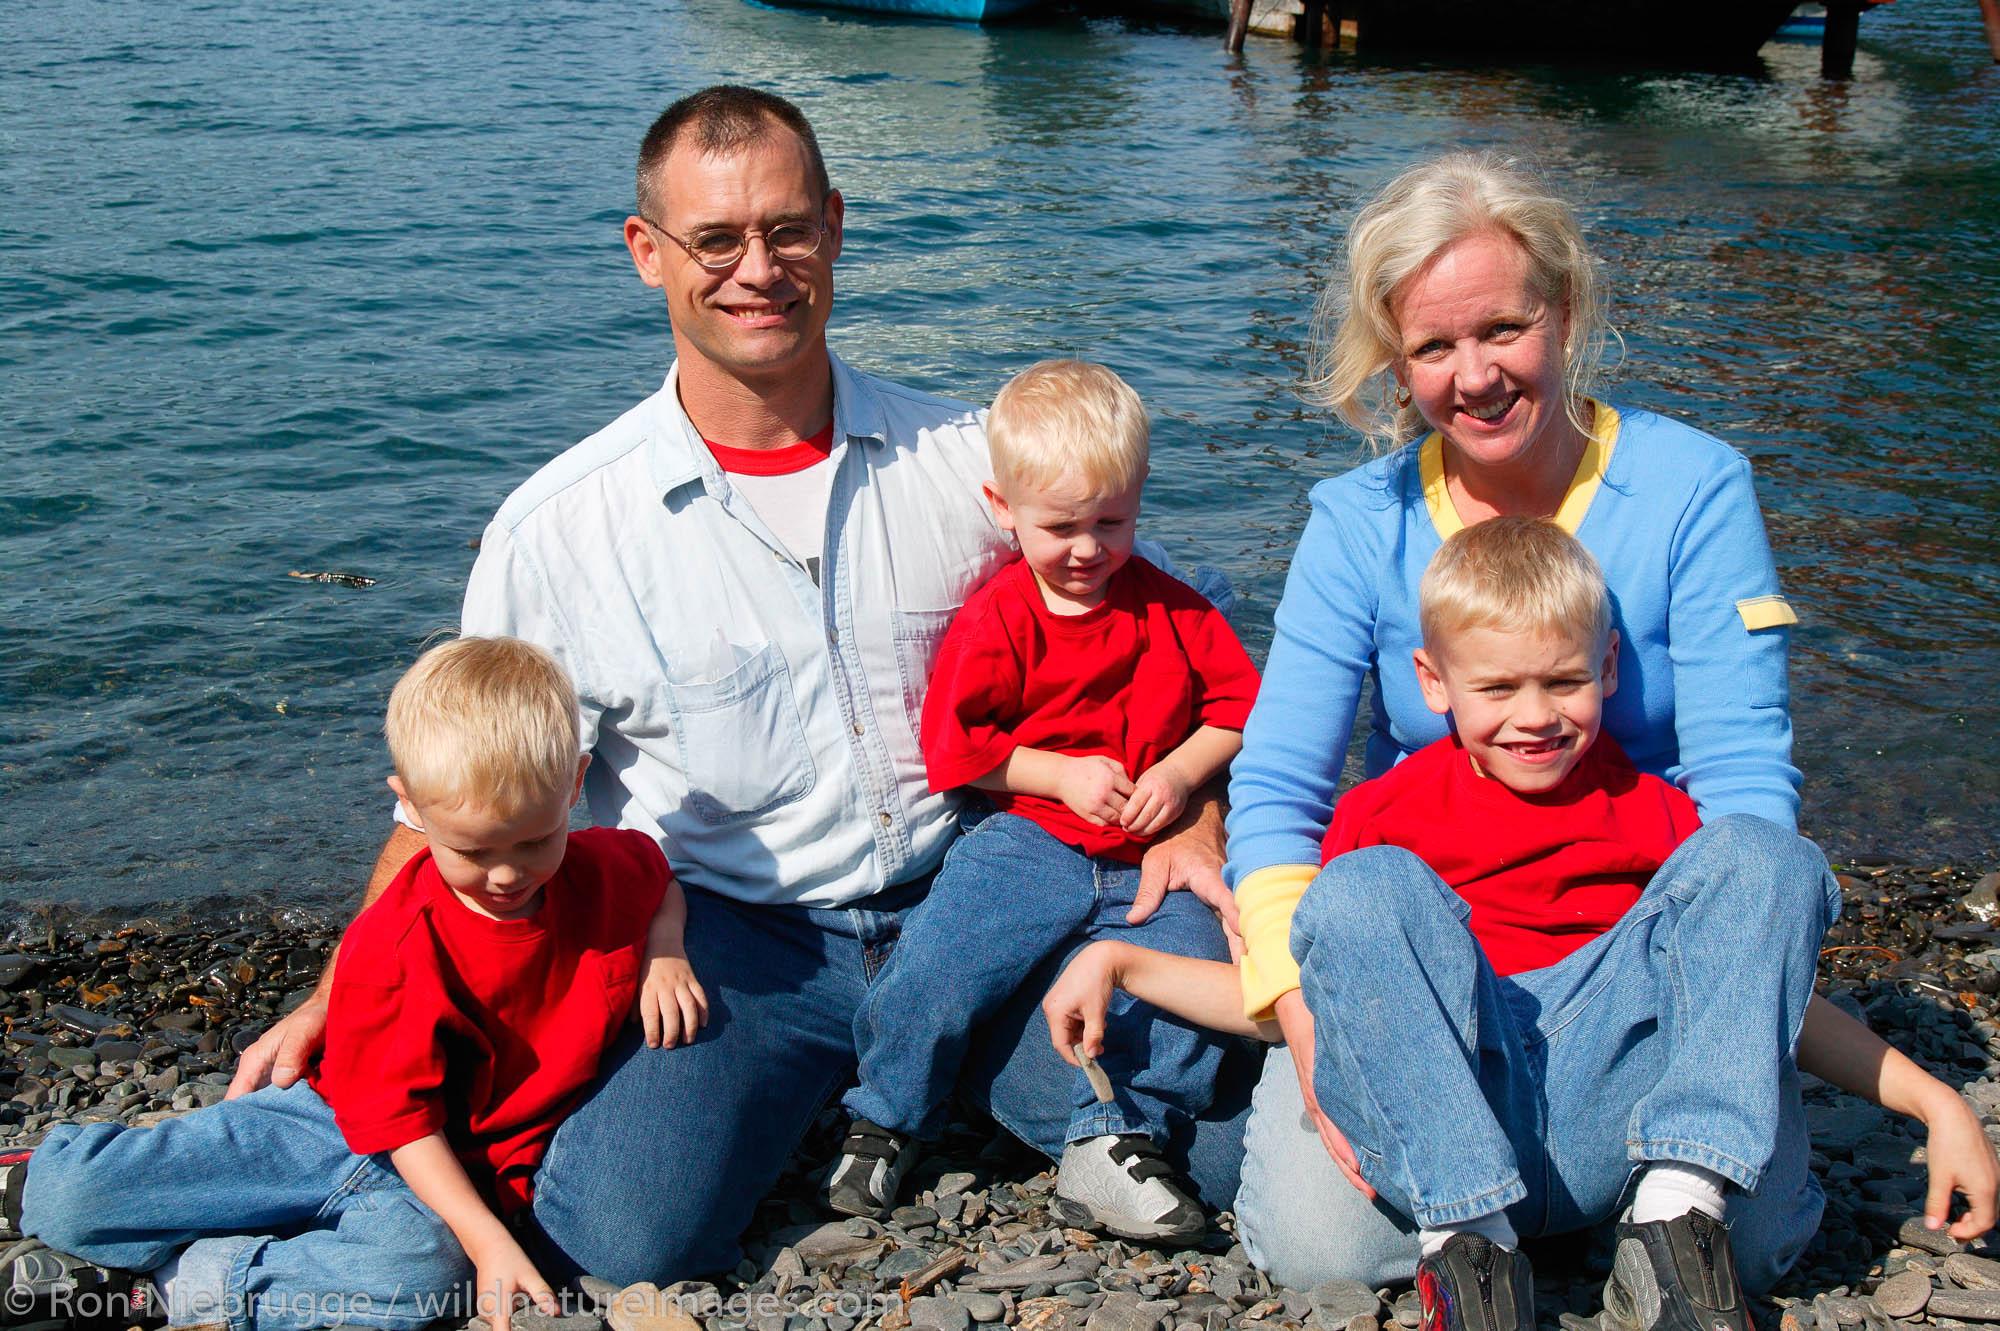 The Blomgren family Kenai Fjords Tours property on Fox Island Resurrection Bay near Seward Alaska.